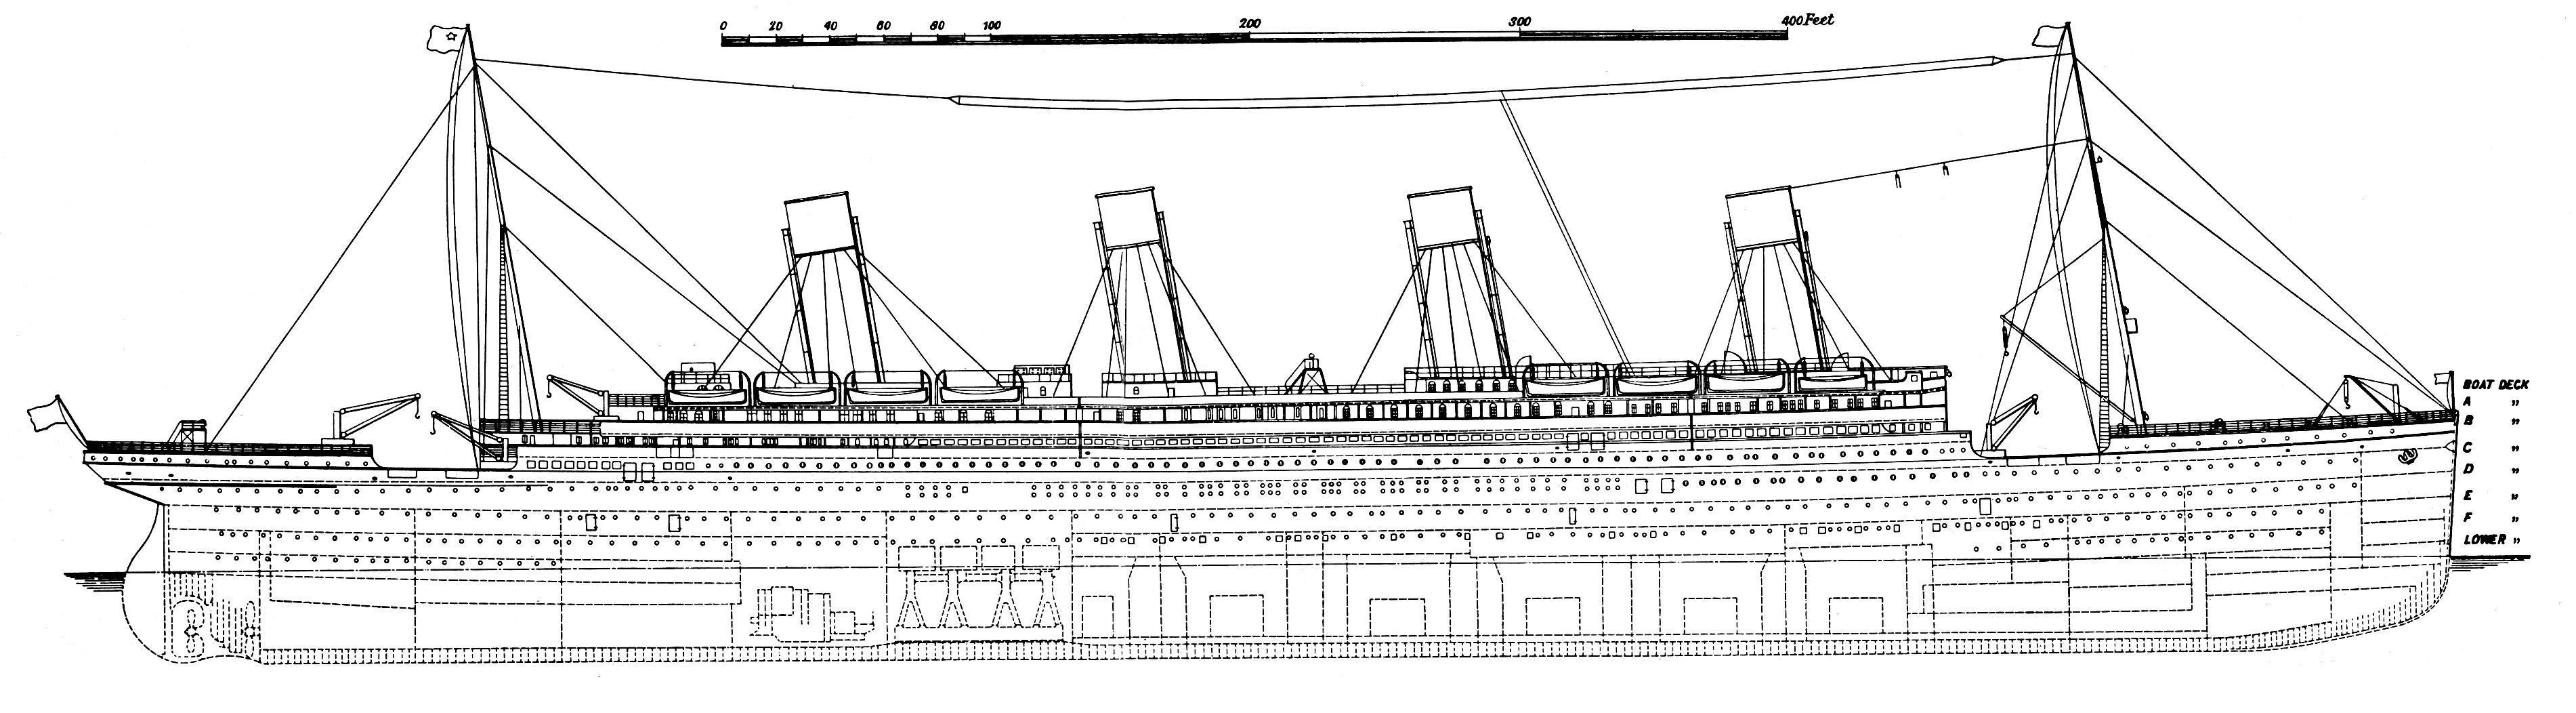 medium resolution of titanic cross section